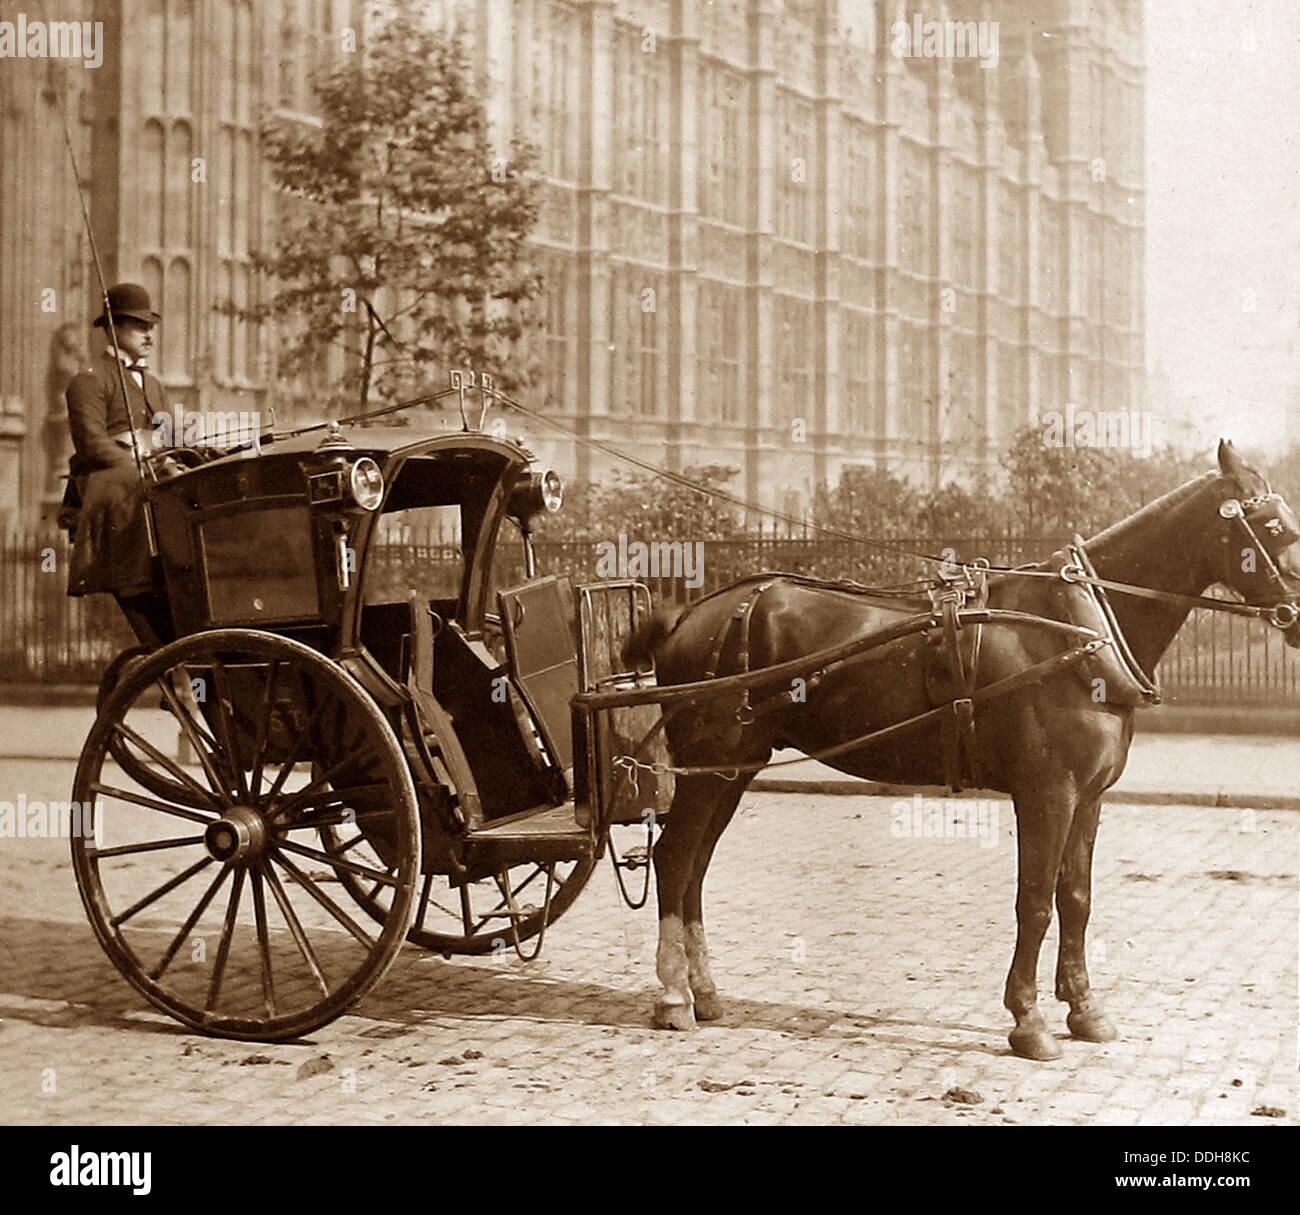 https://i2.wp.com/c8.alamy.com/comp/DDH8KC/london-hansom-cab-victorian-period-DDH8KC.jpg